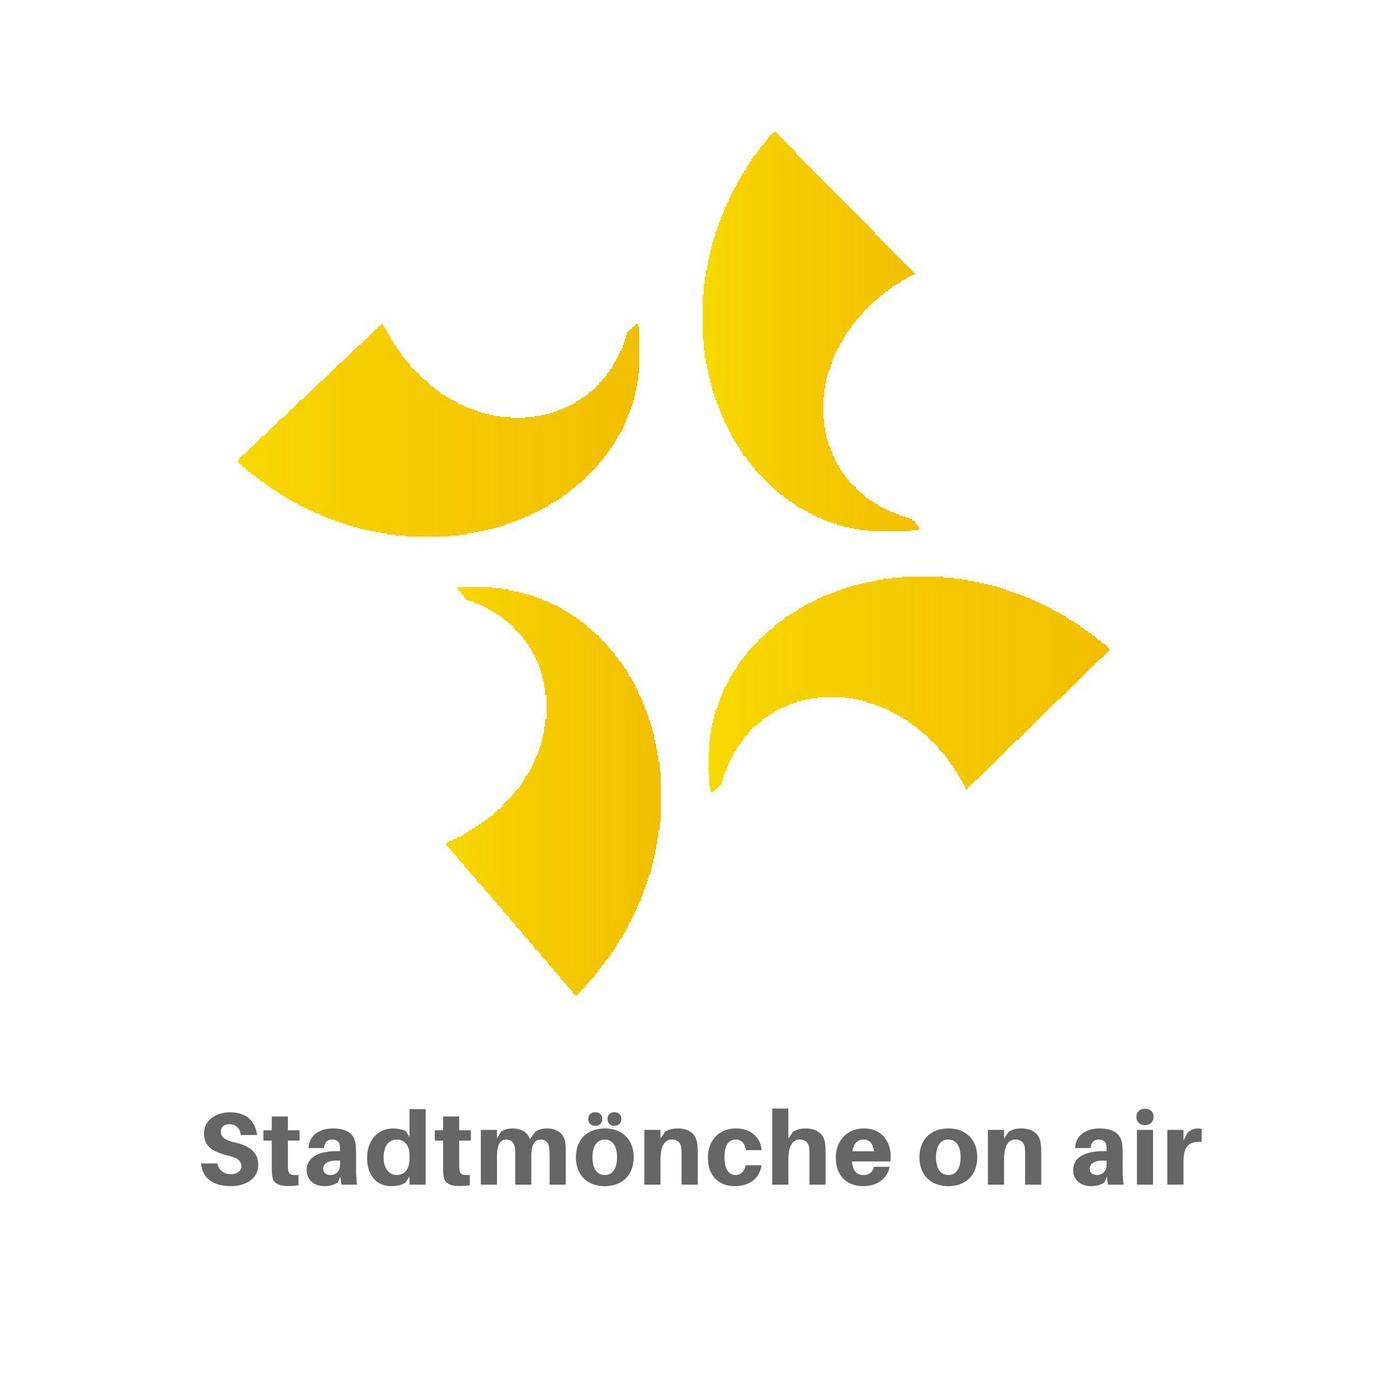 Stadtmönche on air